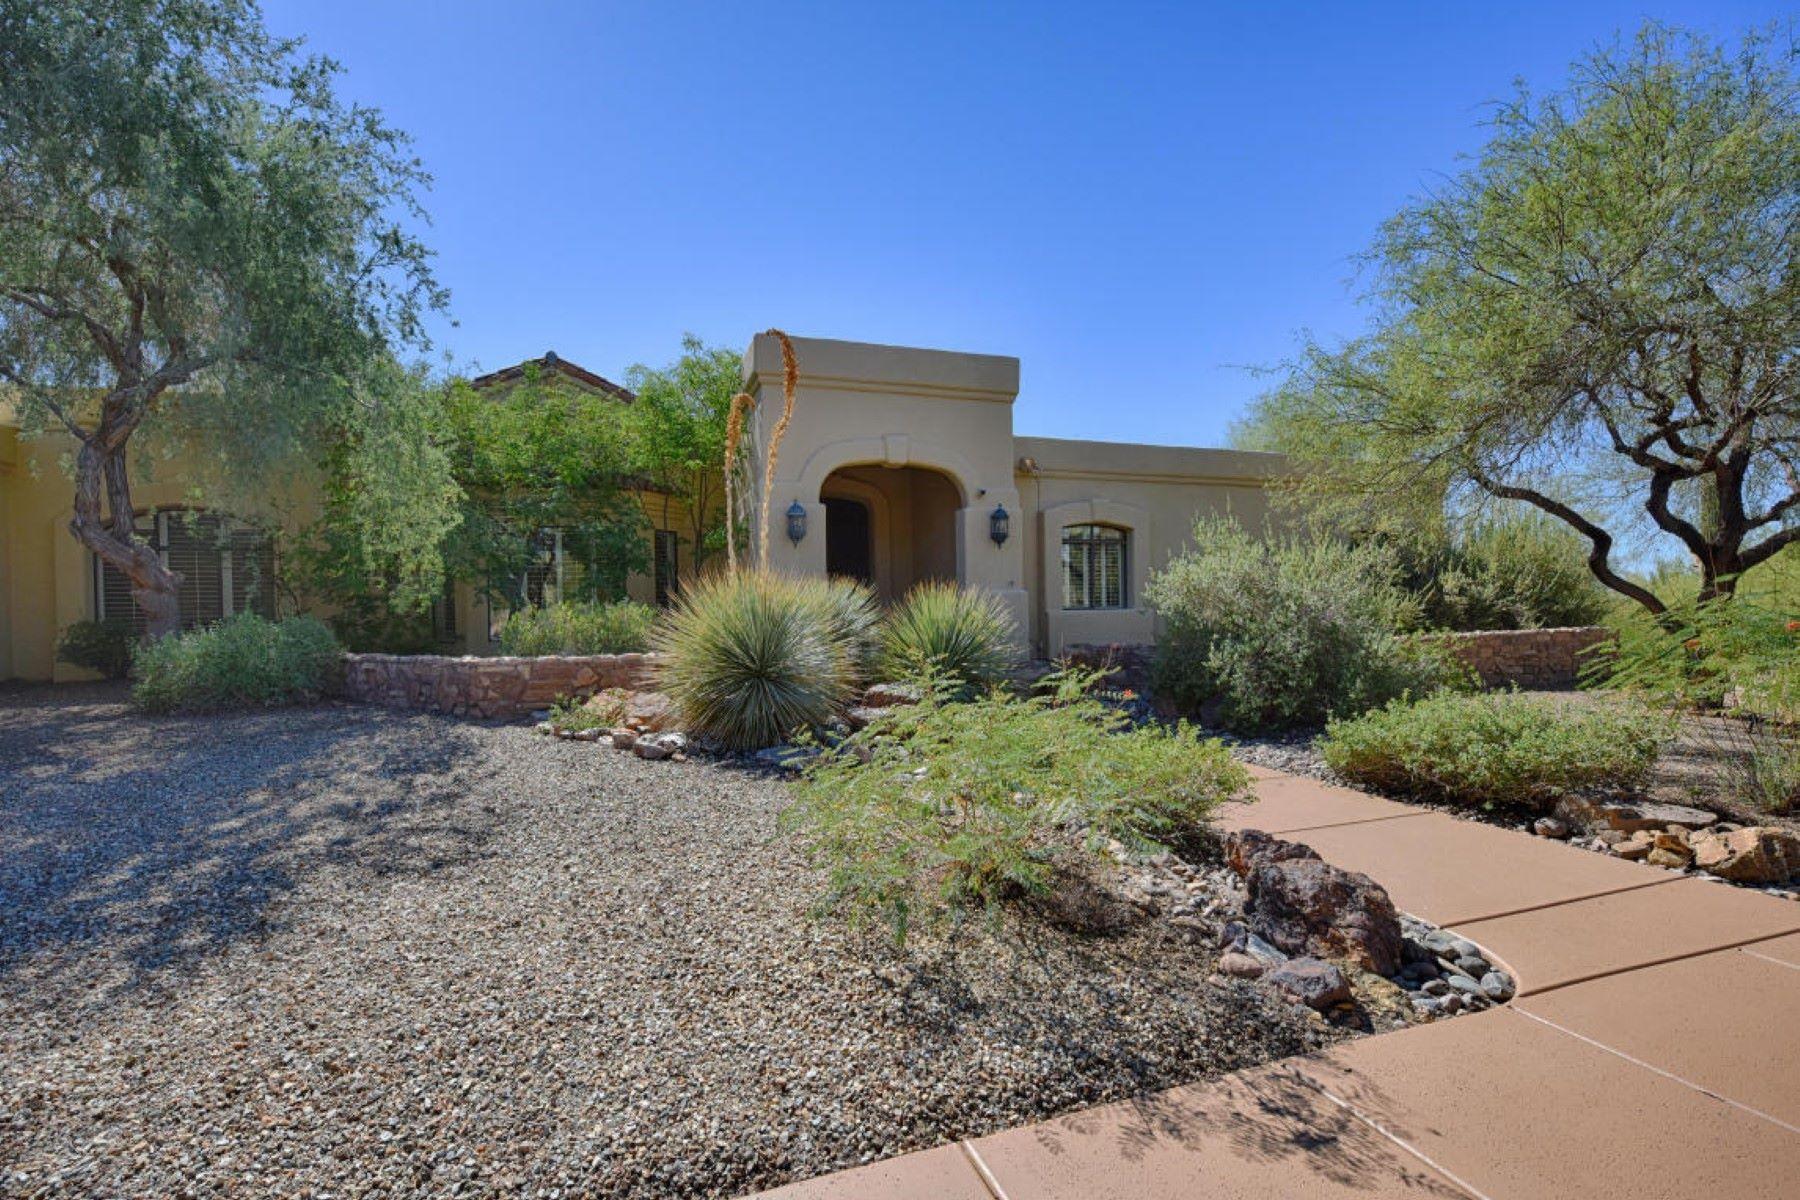 Villa per Vendita alle ore Lovely Scottsdale home in Pinnacle Peak 9725 E Sands Dr Scottsdale, Arizona, 85255 Stati Uniti